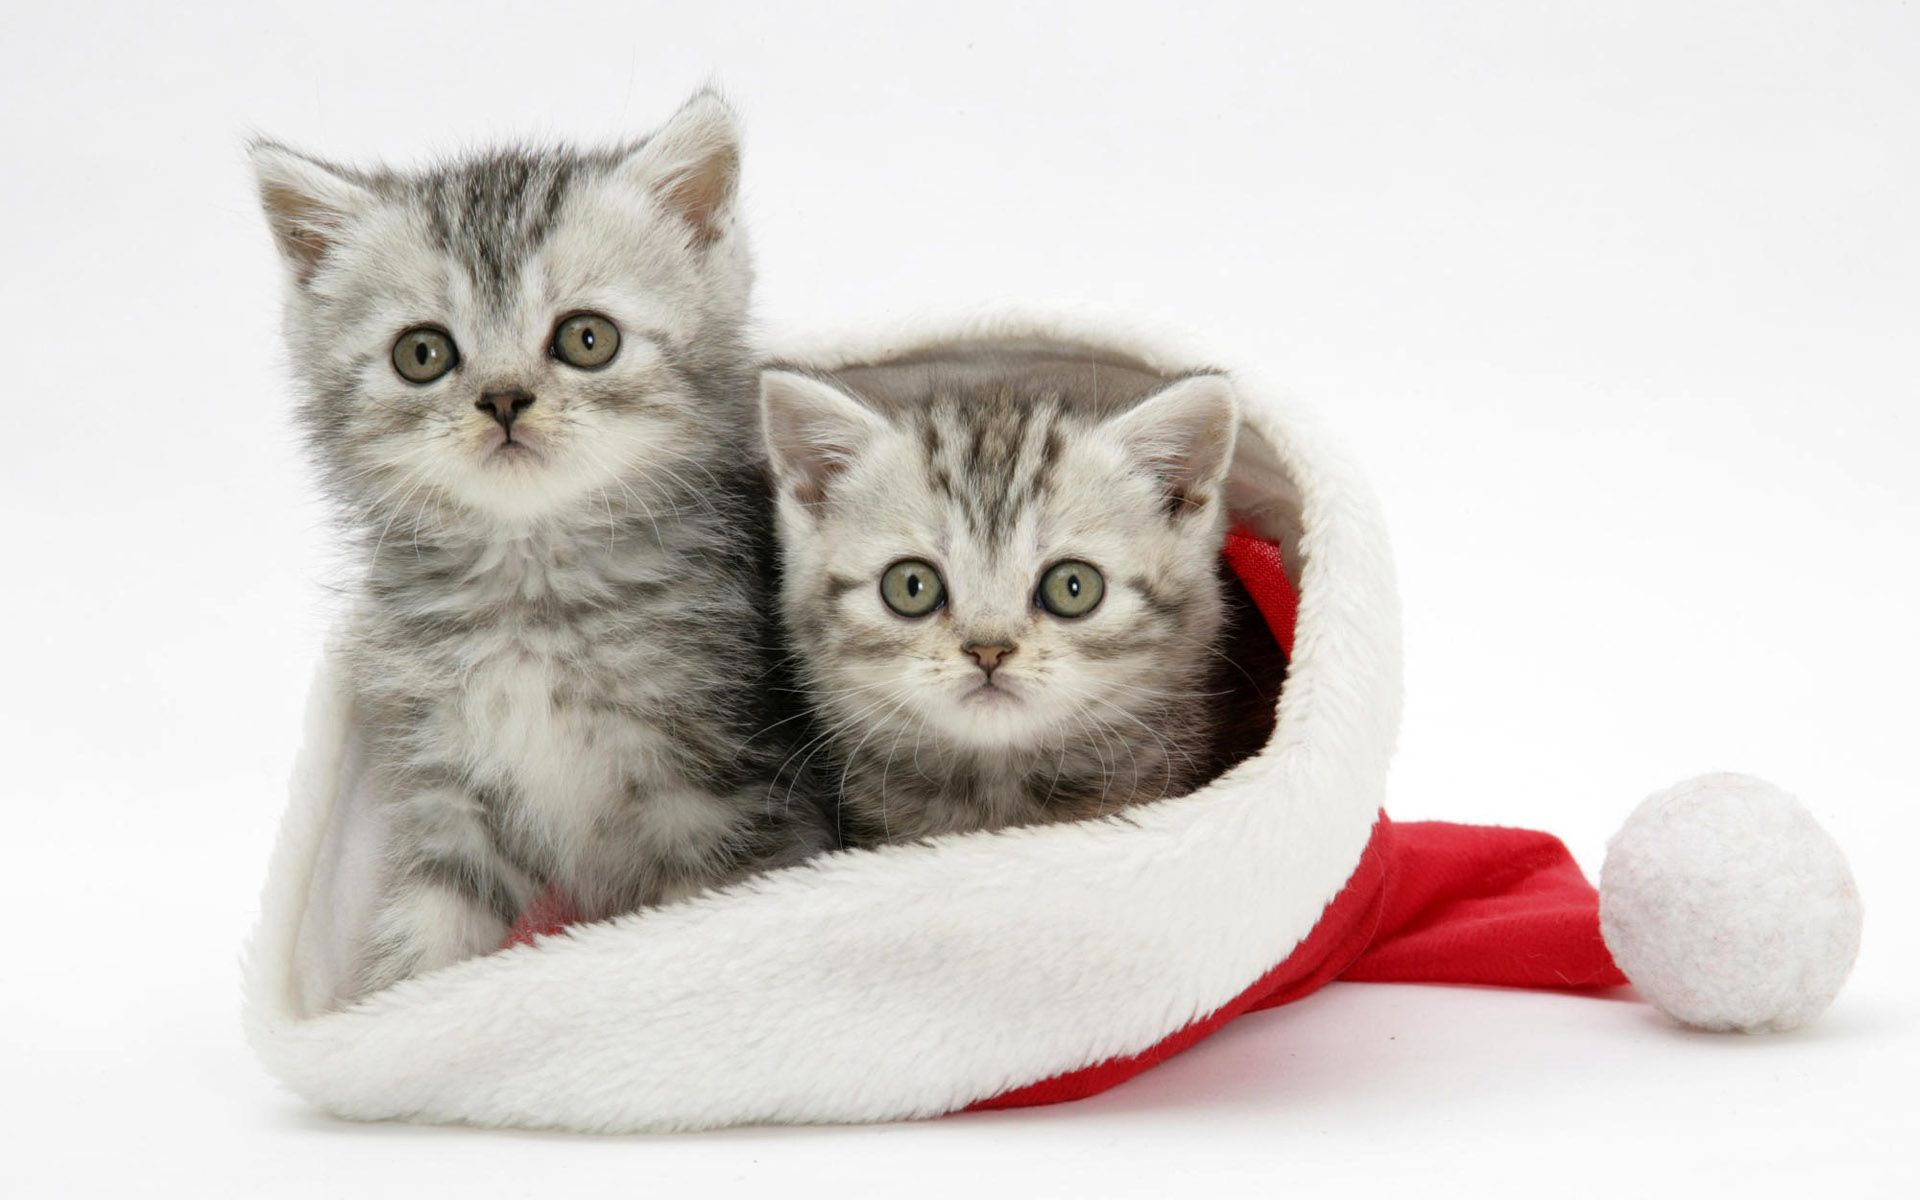 christmassantaandanimalswallpaper Friends in Need Animal